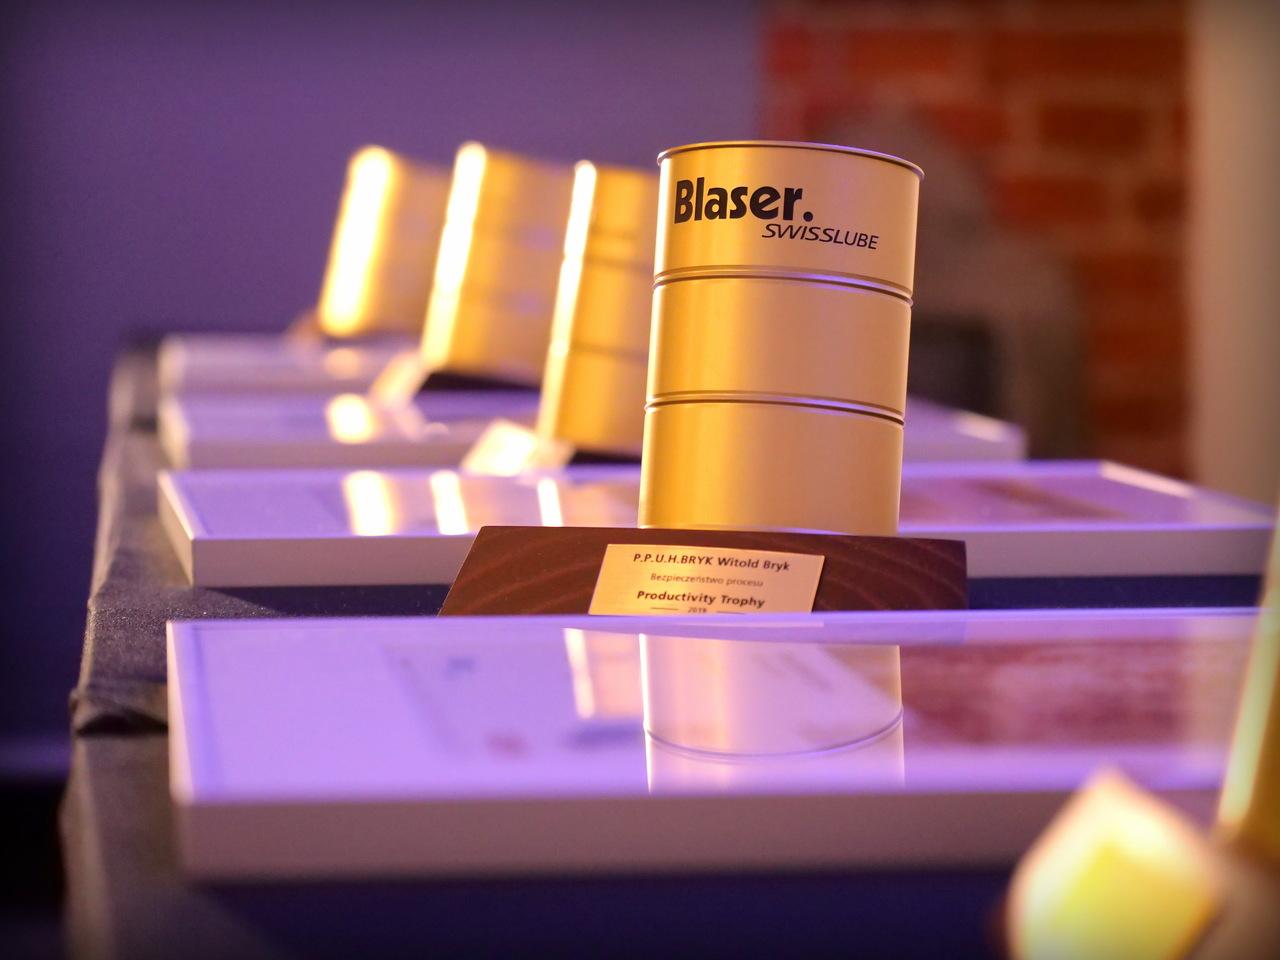 V edycja BLASER Productivity Trophy rozstrzygnięta